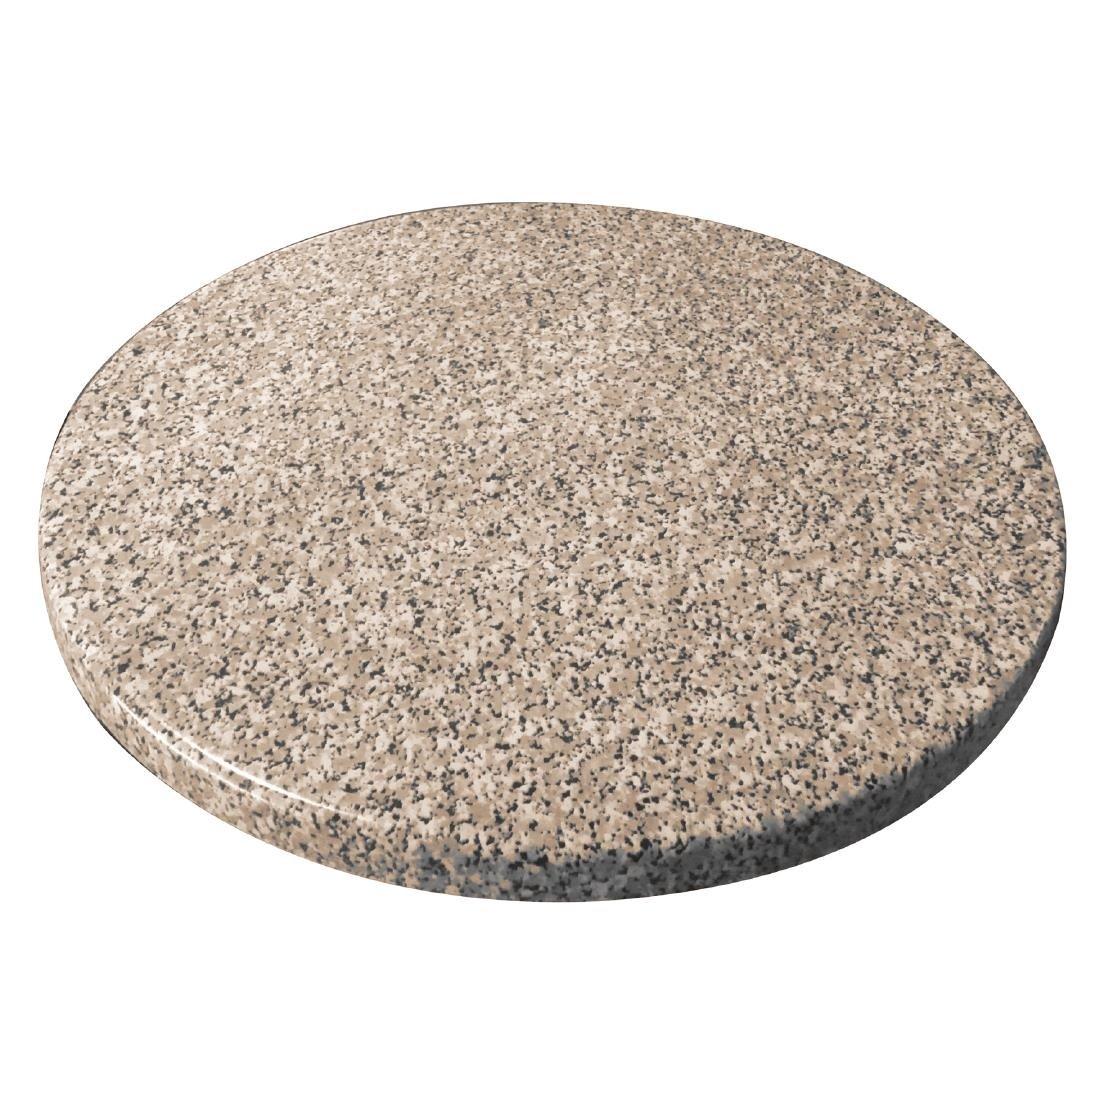 Monero Commercial 80Cm Round Table Top Granite Effect